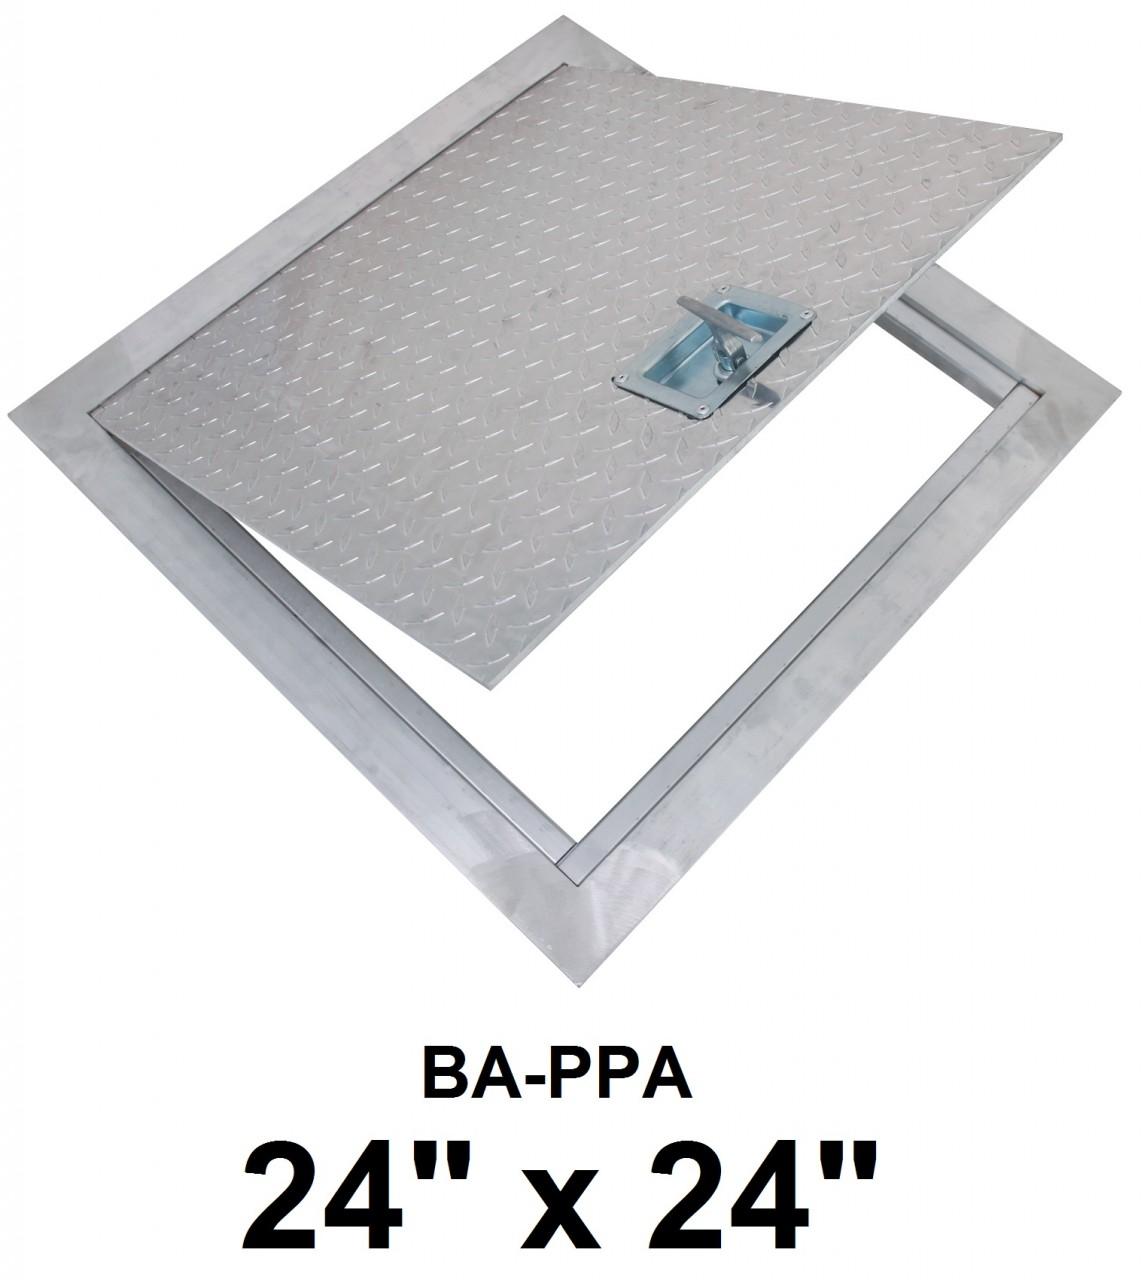 Floor Access Hatch BA-PPA 24 x 24 Flush Aluminum – BEST